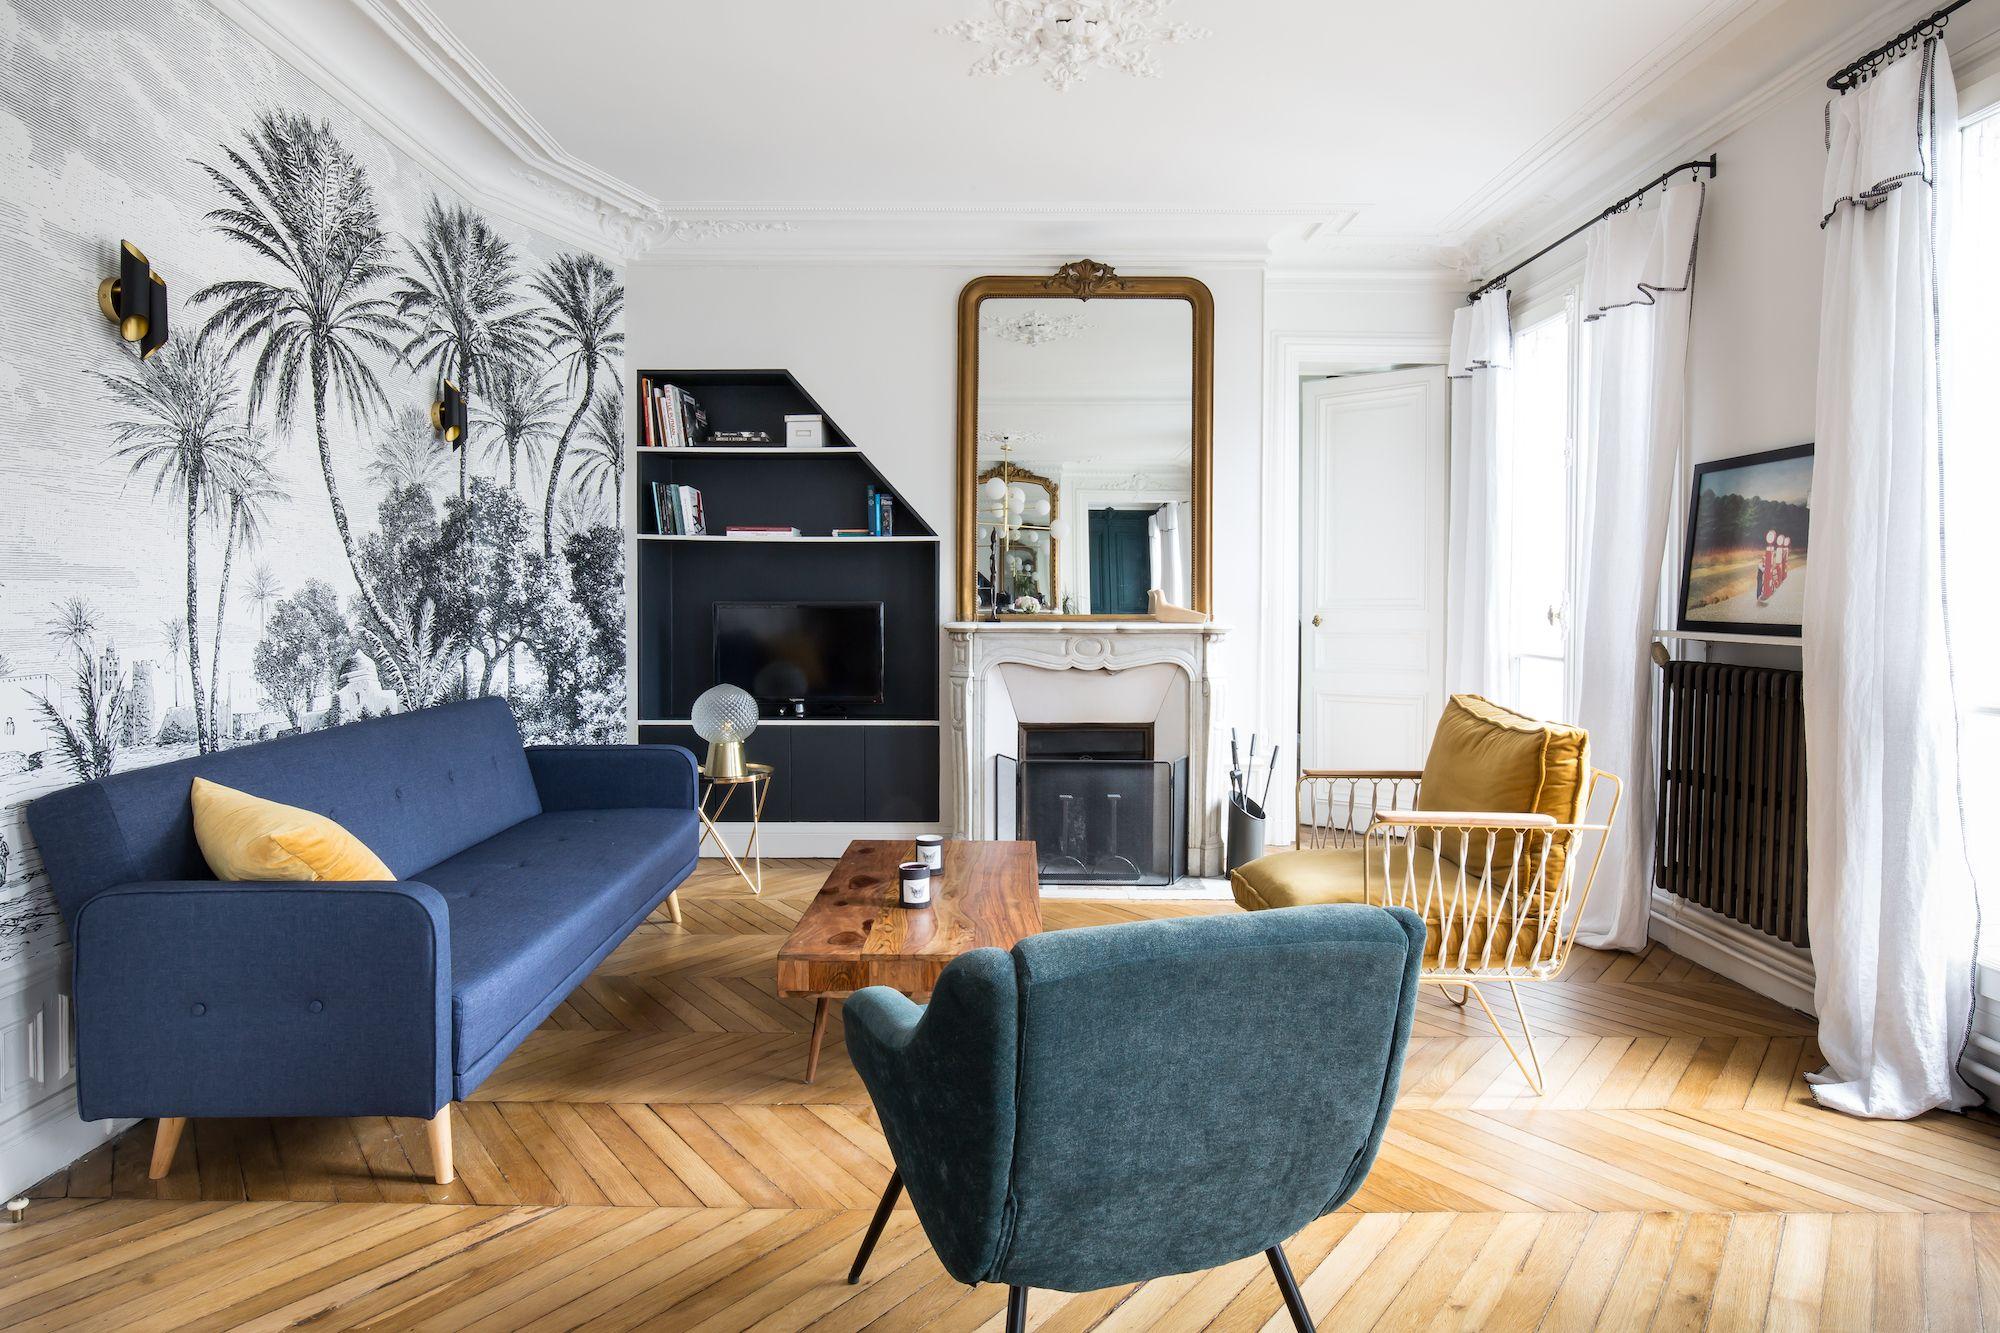 Rue De Maubeuge Caroline Andreoni Agence De Design D Interieur Caroline Andreoni En 2020 Appartement Salon Appartement Amenagement Salon